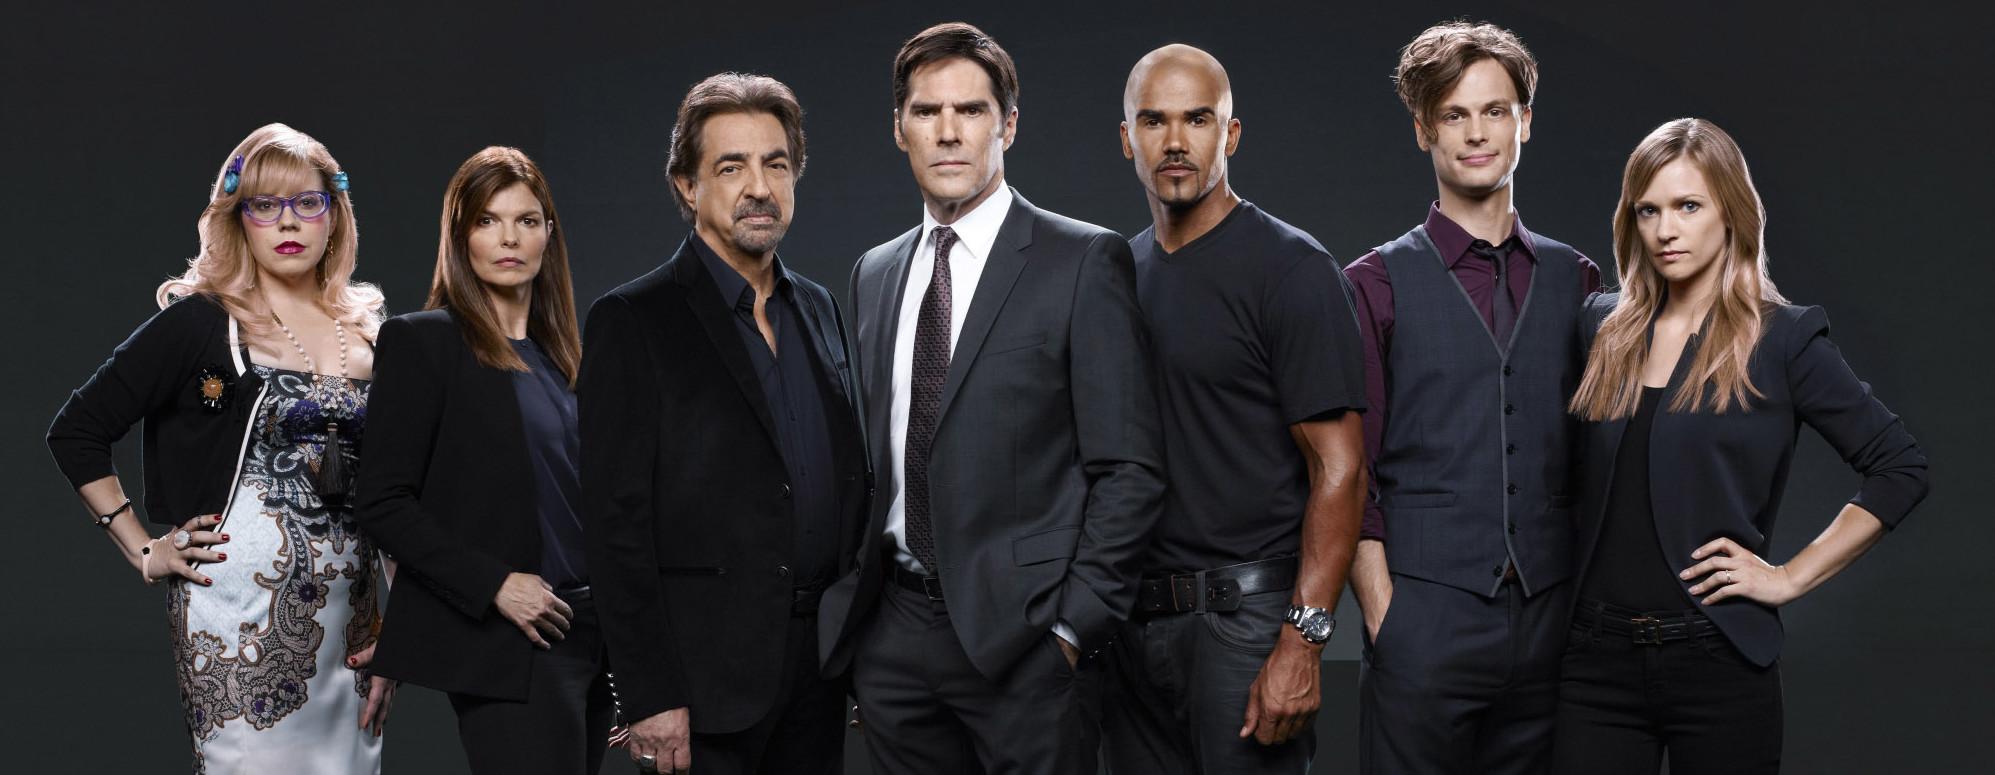 series de television de paga criminal-minds